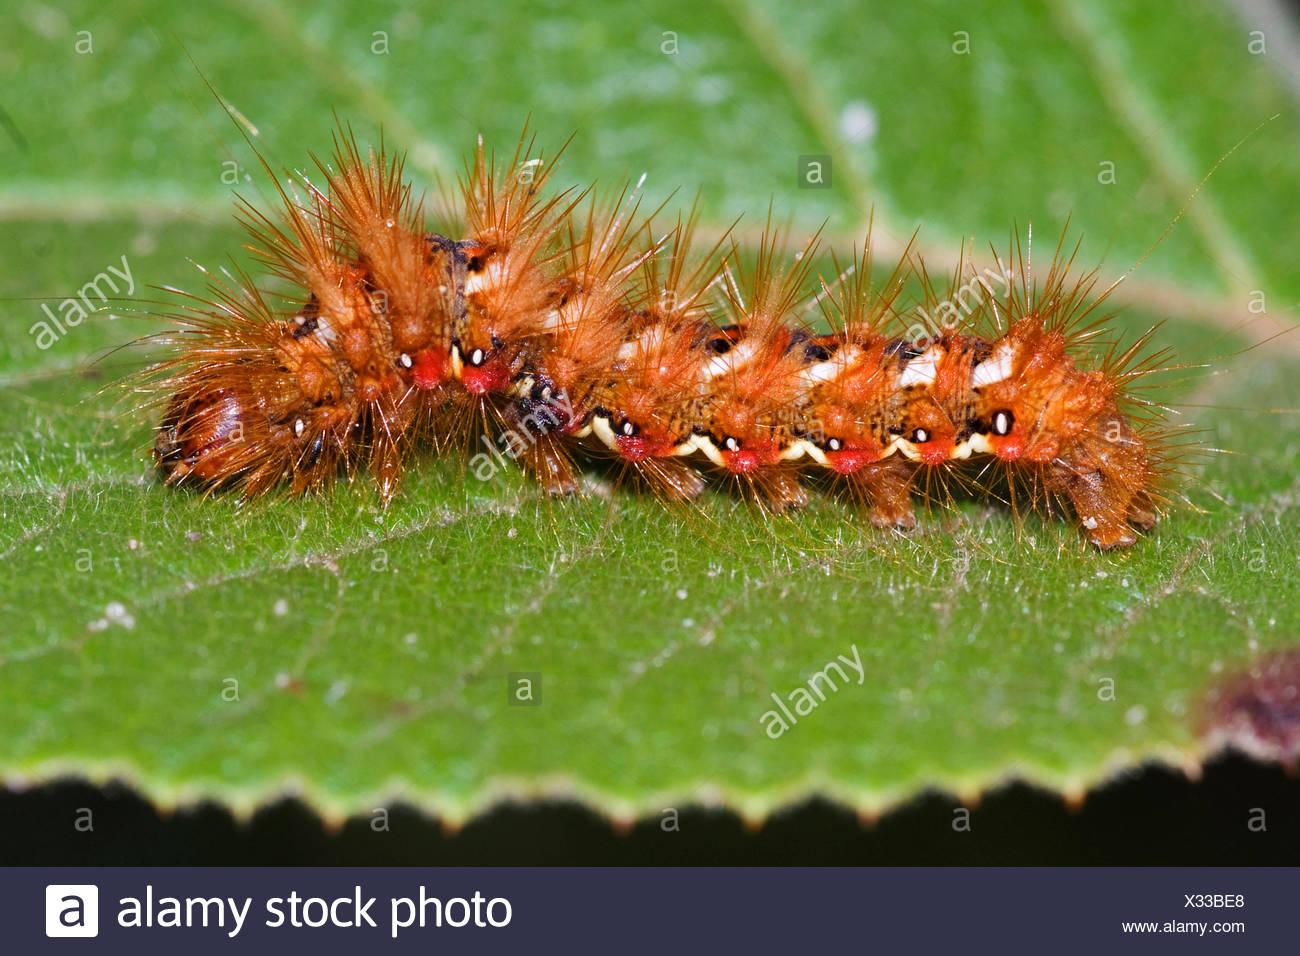 knot grass (Acronicta rumicis, Apatele rumicis), caterpillar on a leaf, Germany - Stock Image